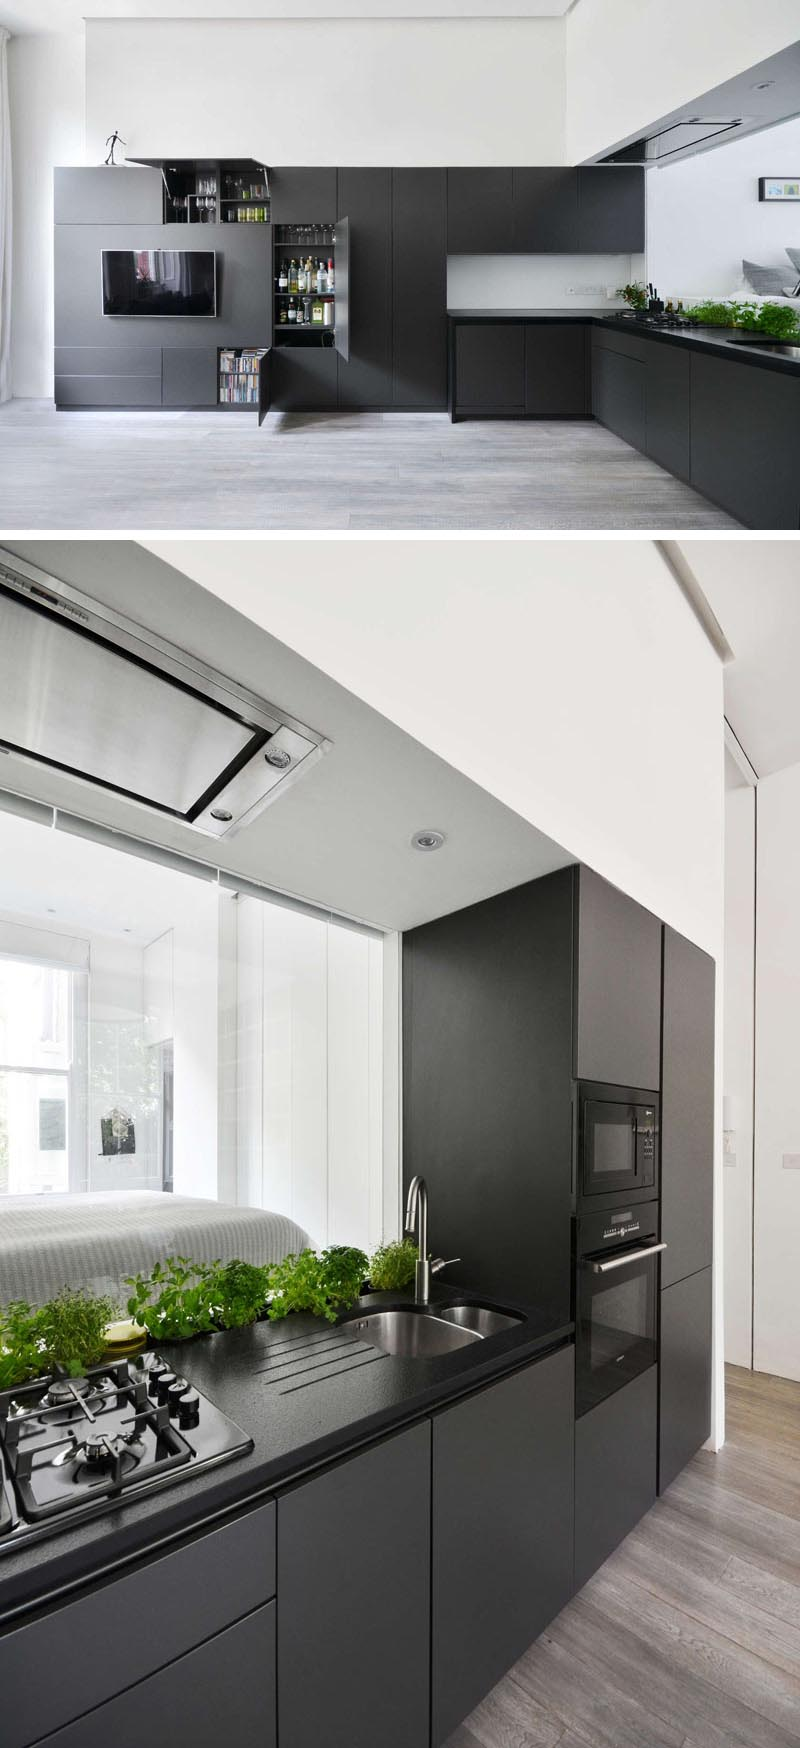 Daniele Petteno Architecture Workshop designed a matte black kitchen in a London apartment.